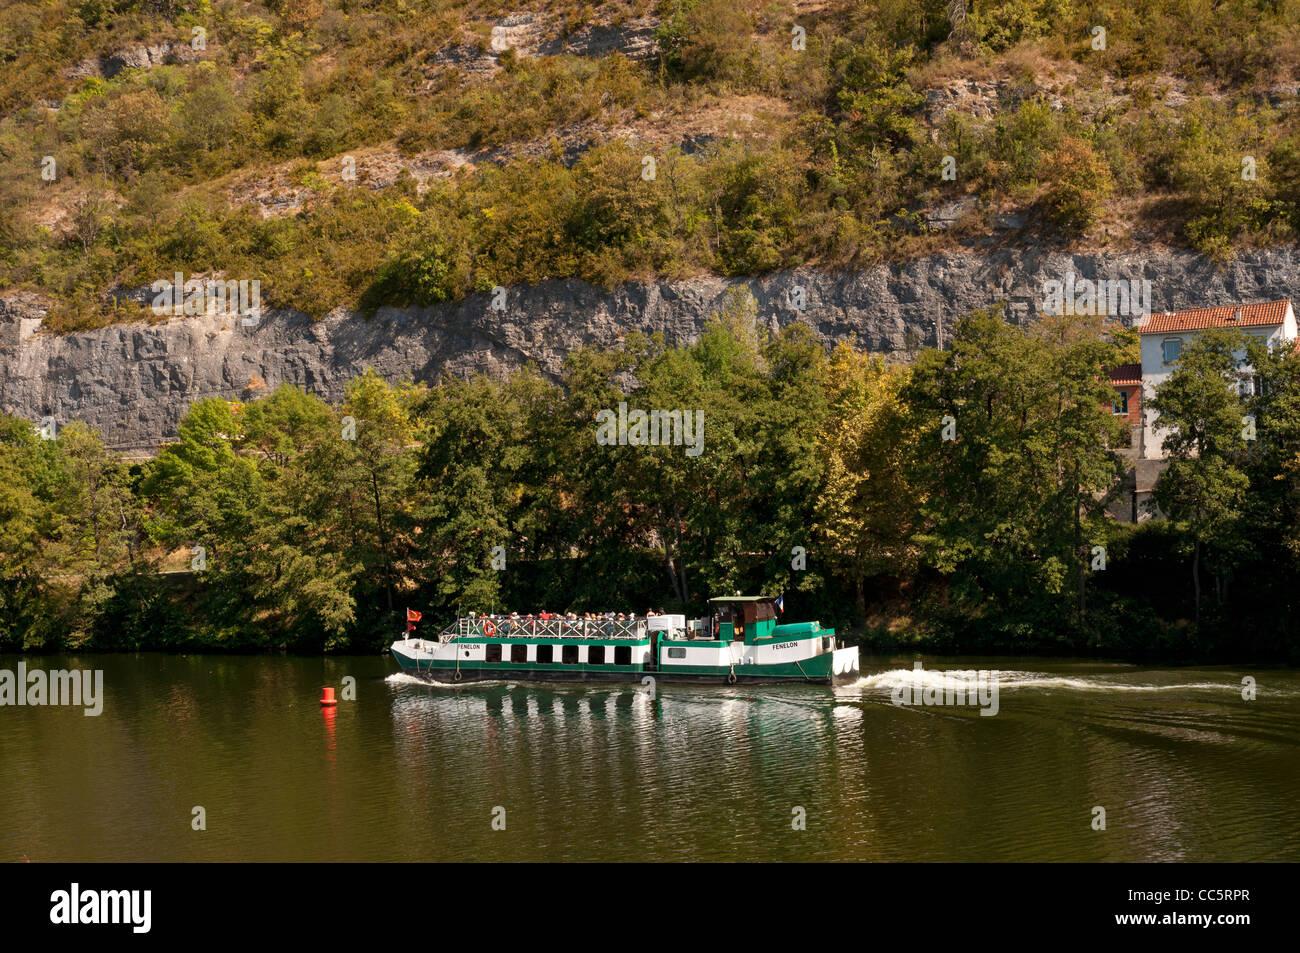 River tourist cruising boat Fenelon on River Lot in the Périgord region of France - Stock Image